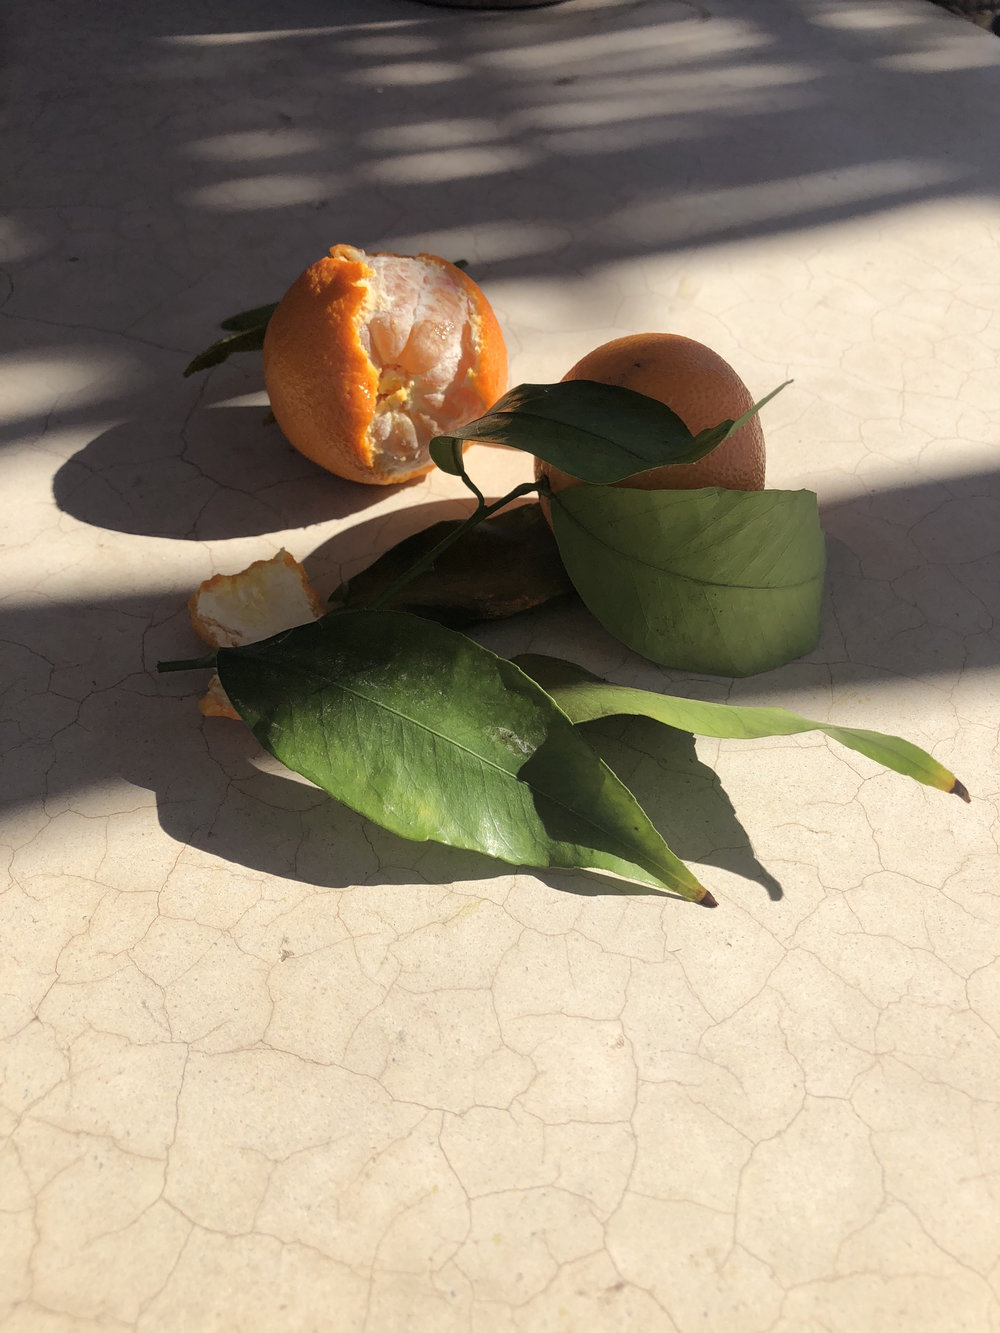 Orangeinsunlight.jpg